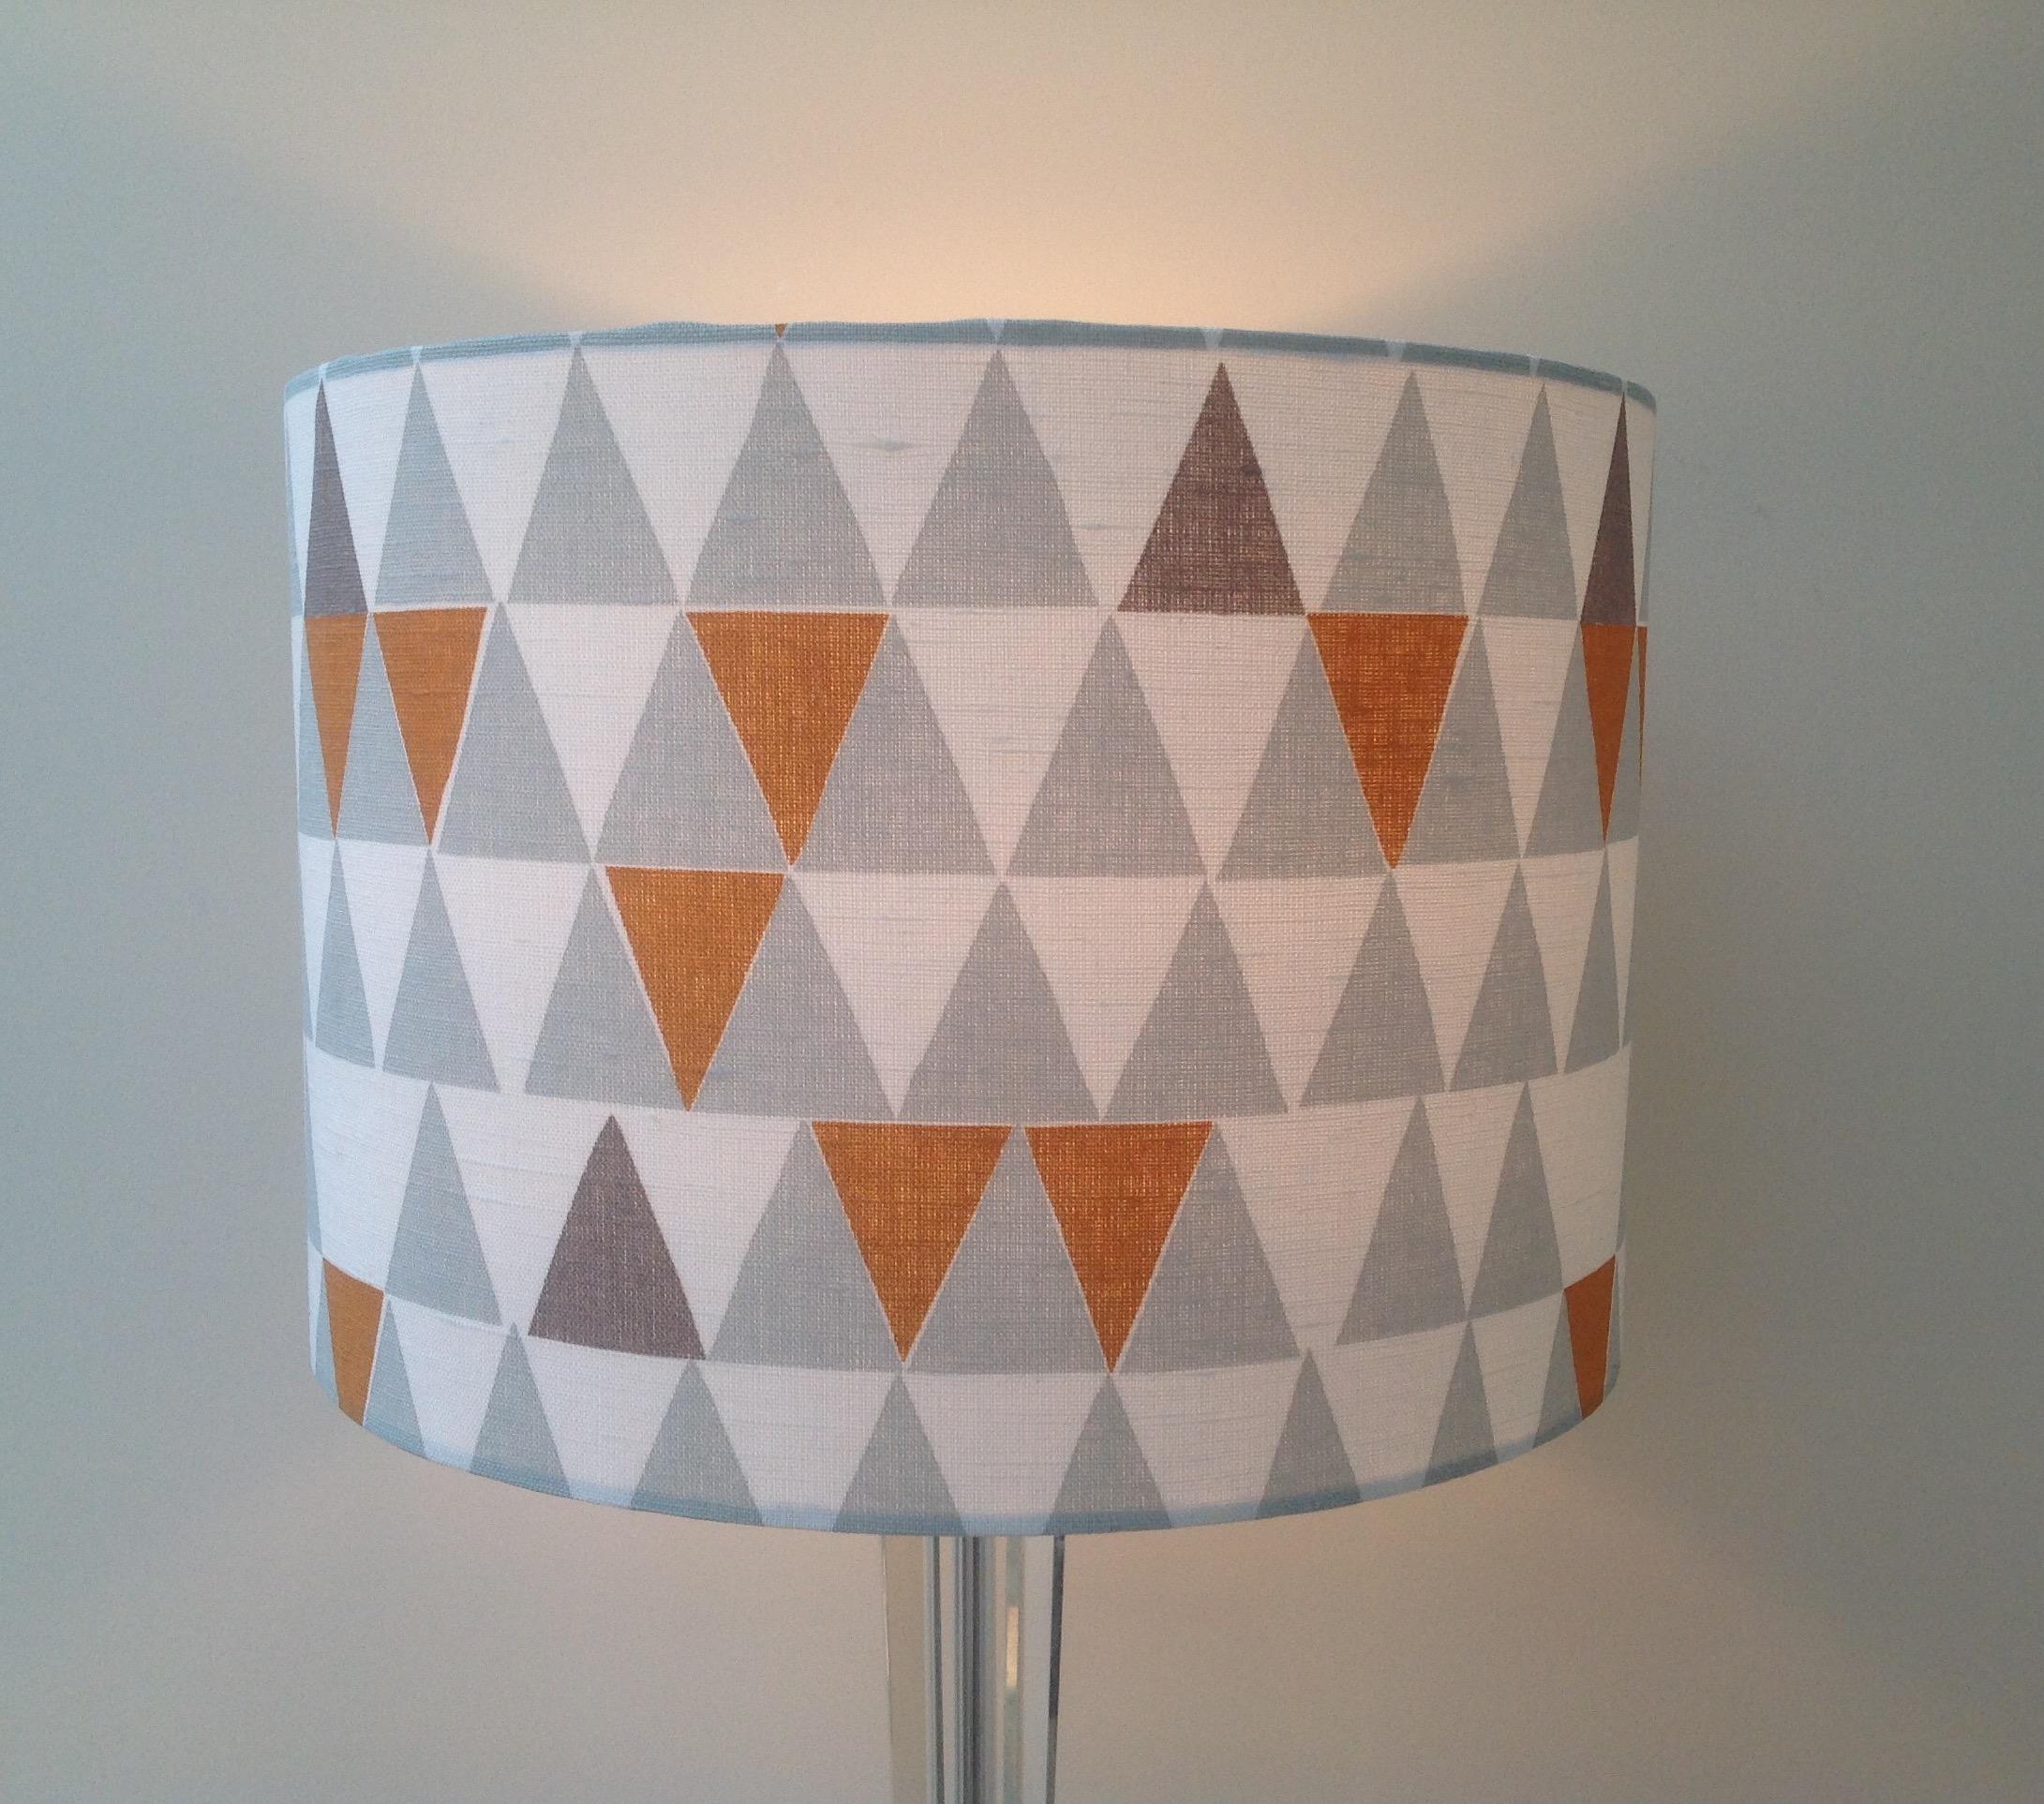 Scandinavian lampshades julias lampshades scandinavian style lampshade 1 2 aloadofball Image collections